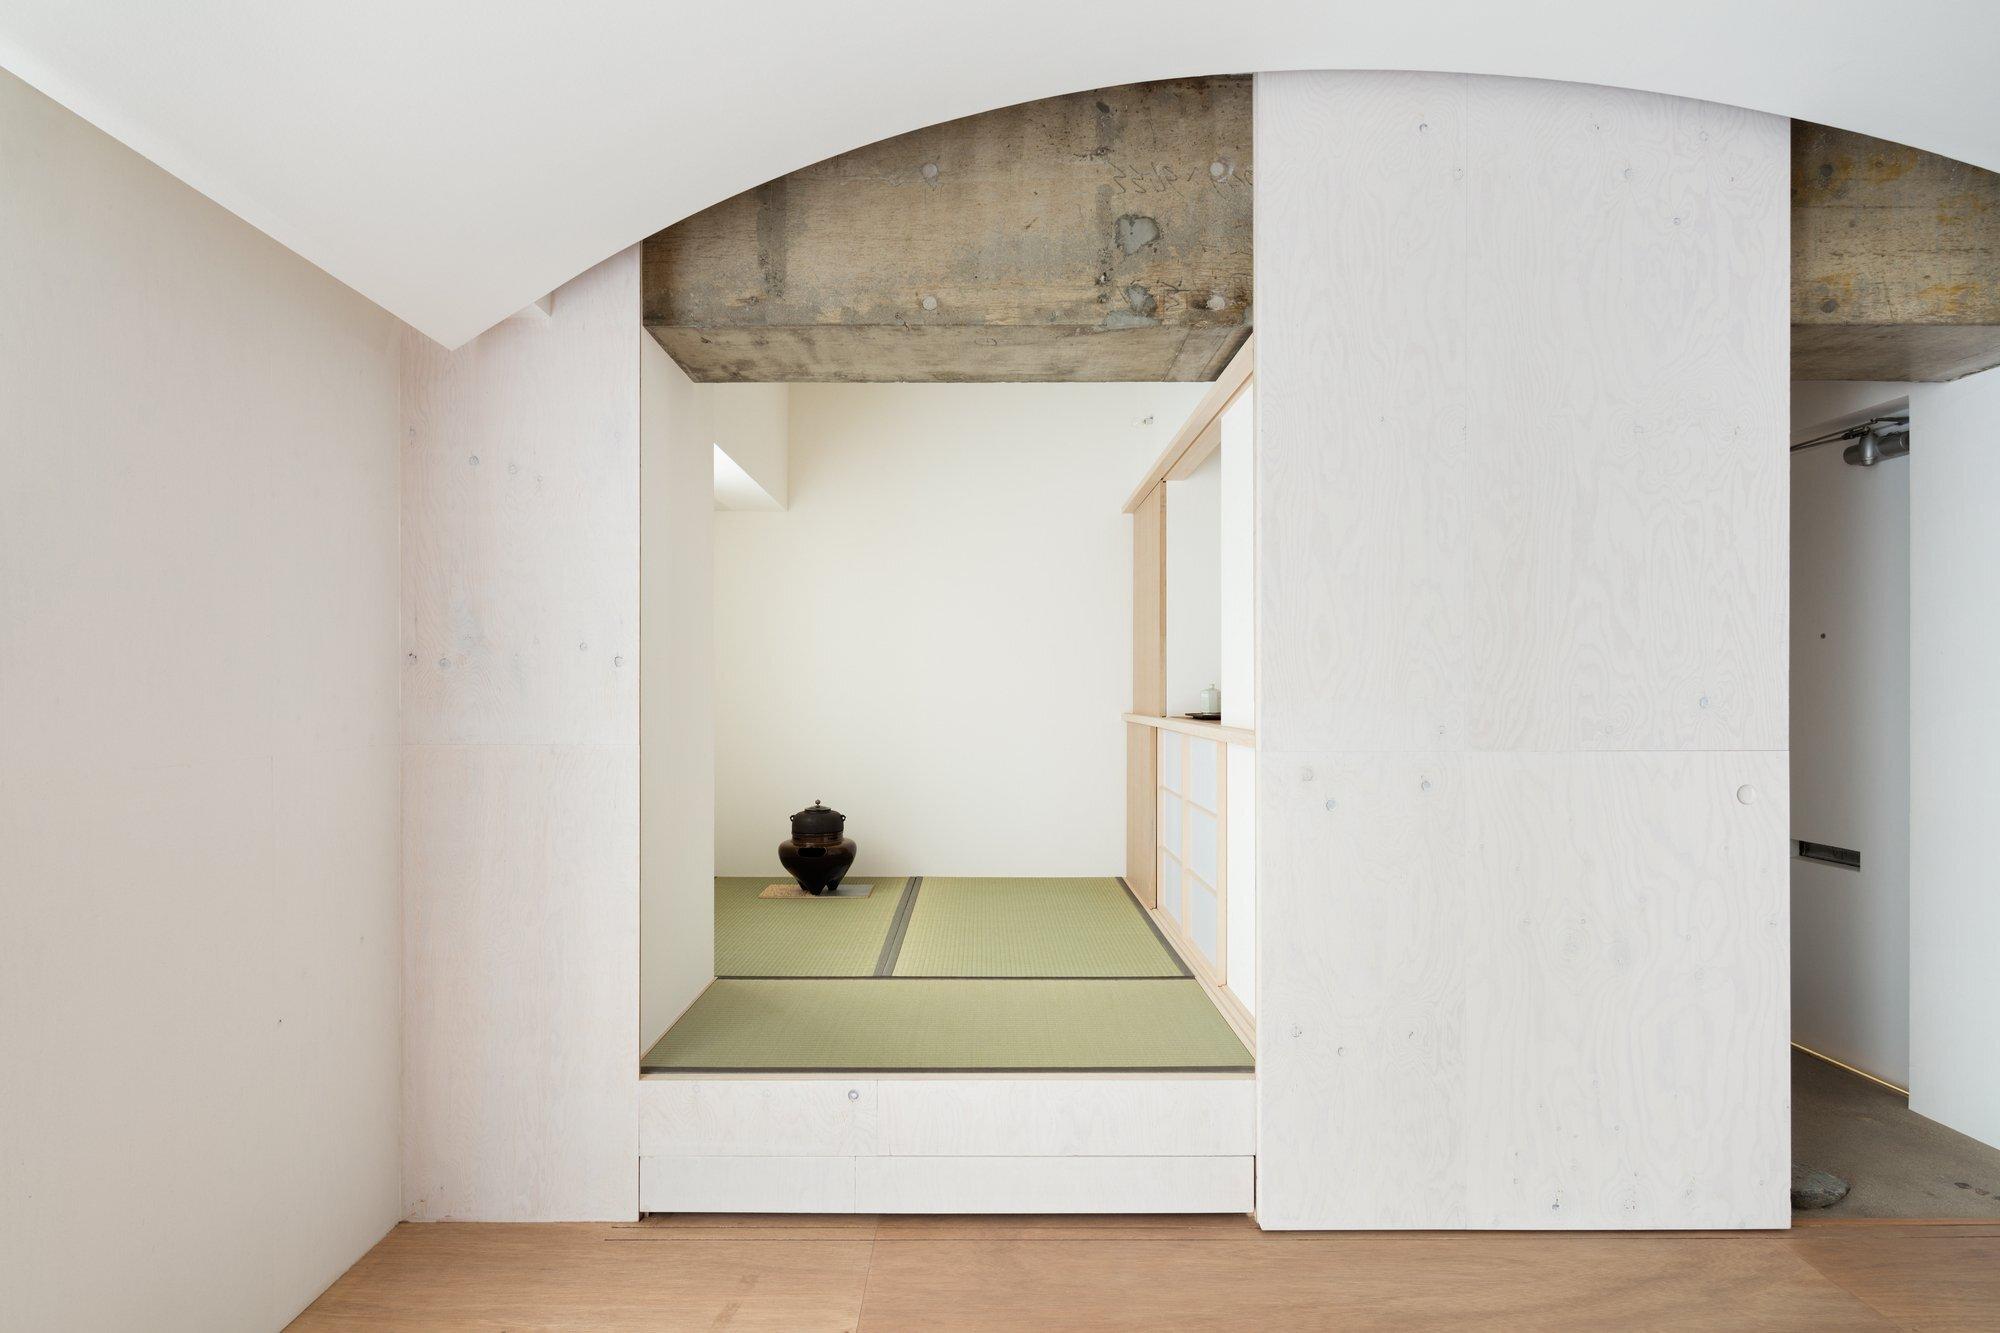 Team Living House - Masatoshi Hirai Architects Atelier - Tokyo - Japanese Room - Humble Homes